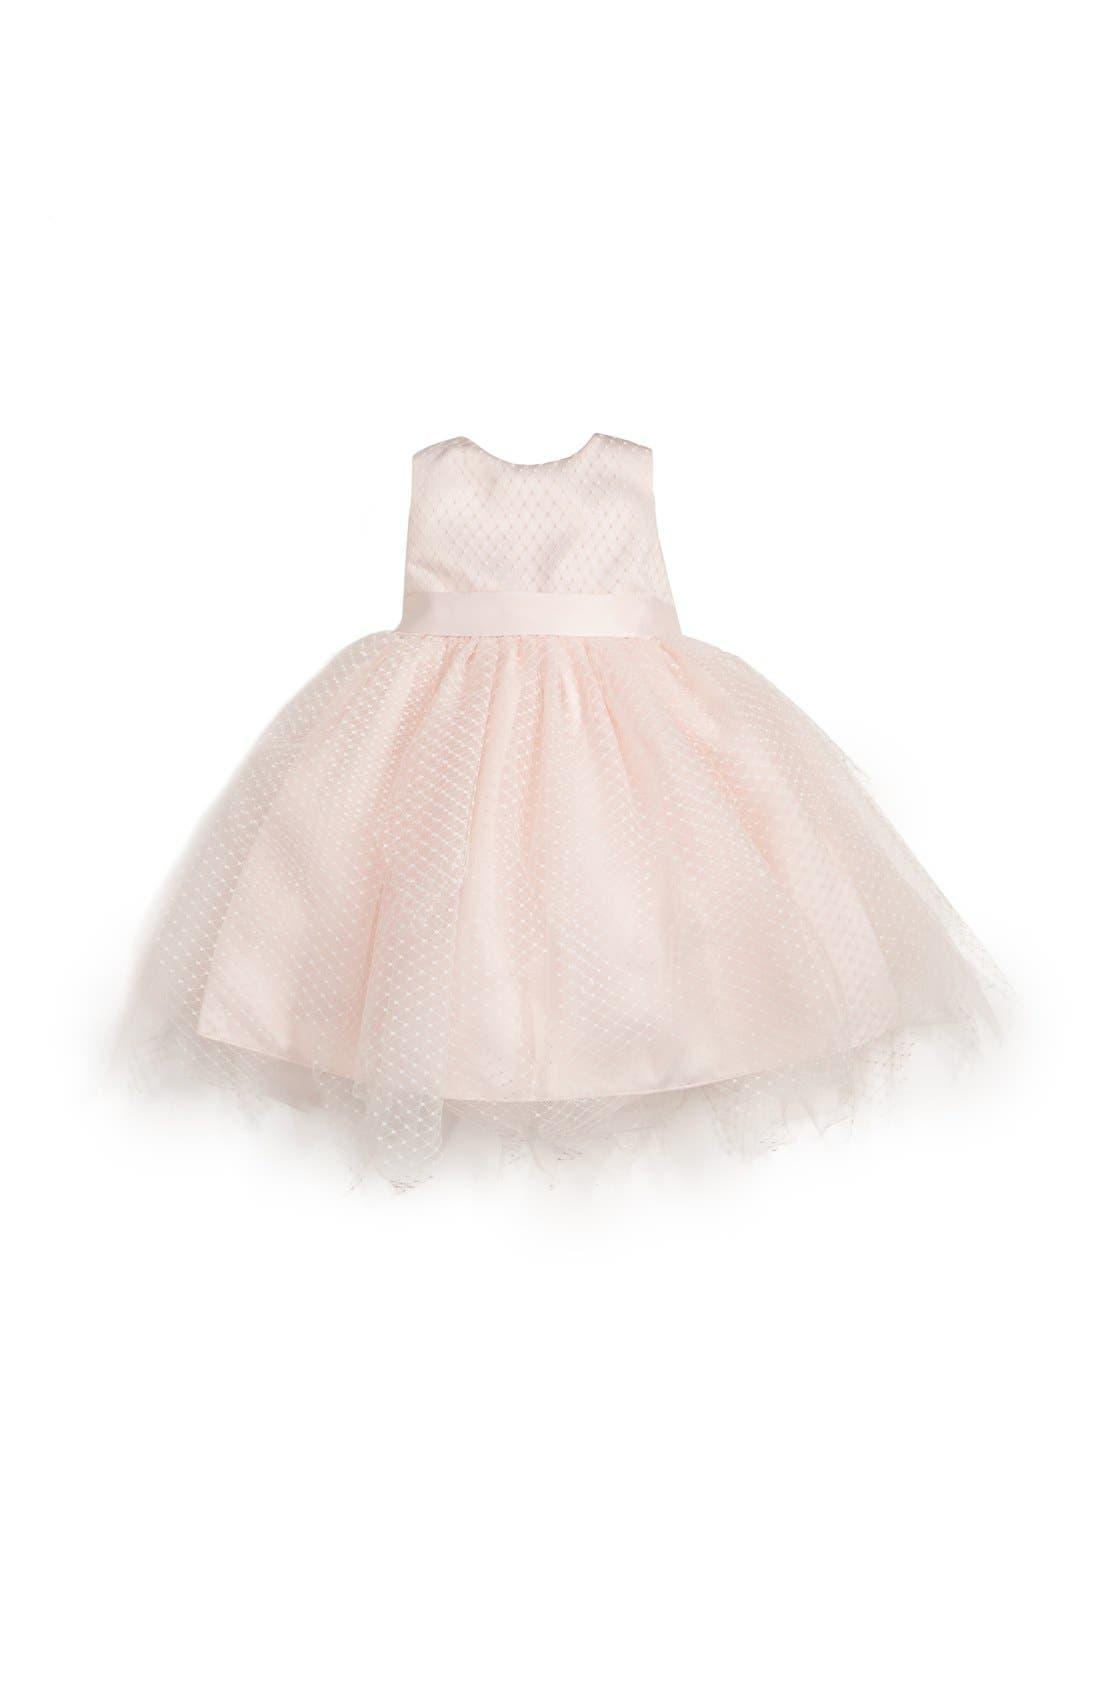 Alternate Image 1 Selected - Us Angels Tulle Overlay Sleeveless Dress (Baby Girls)